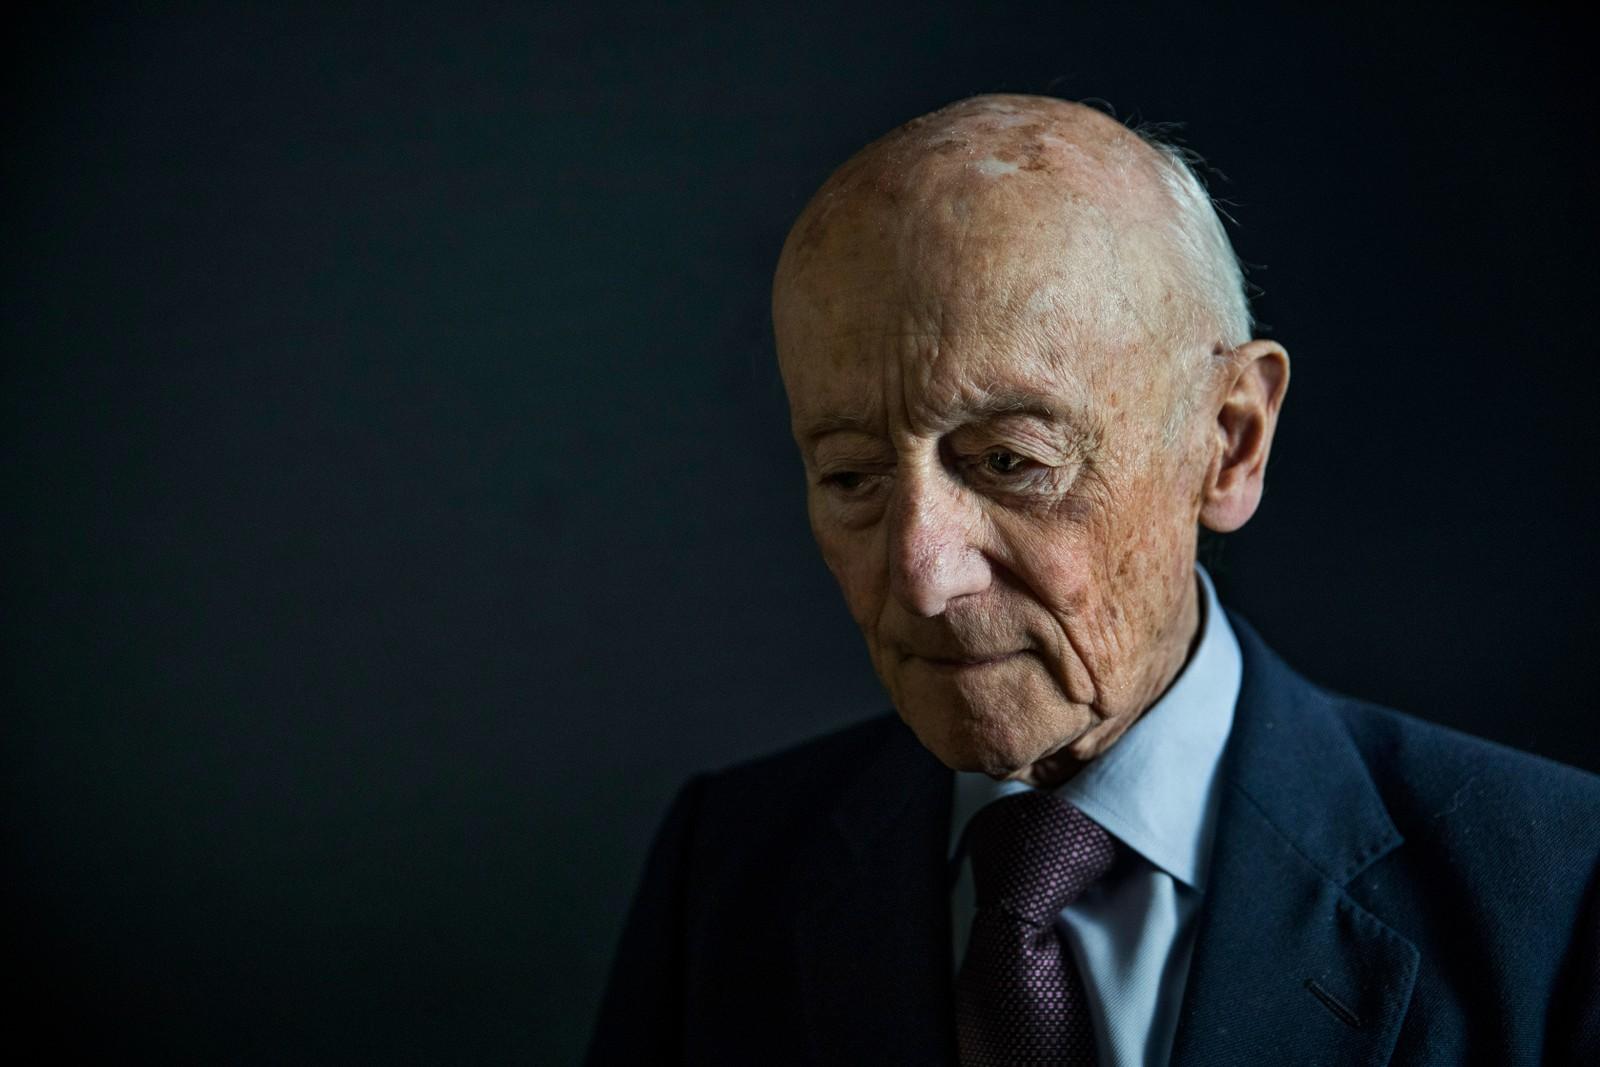 Tidligere statsminister Kåre Willoch (88).